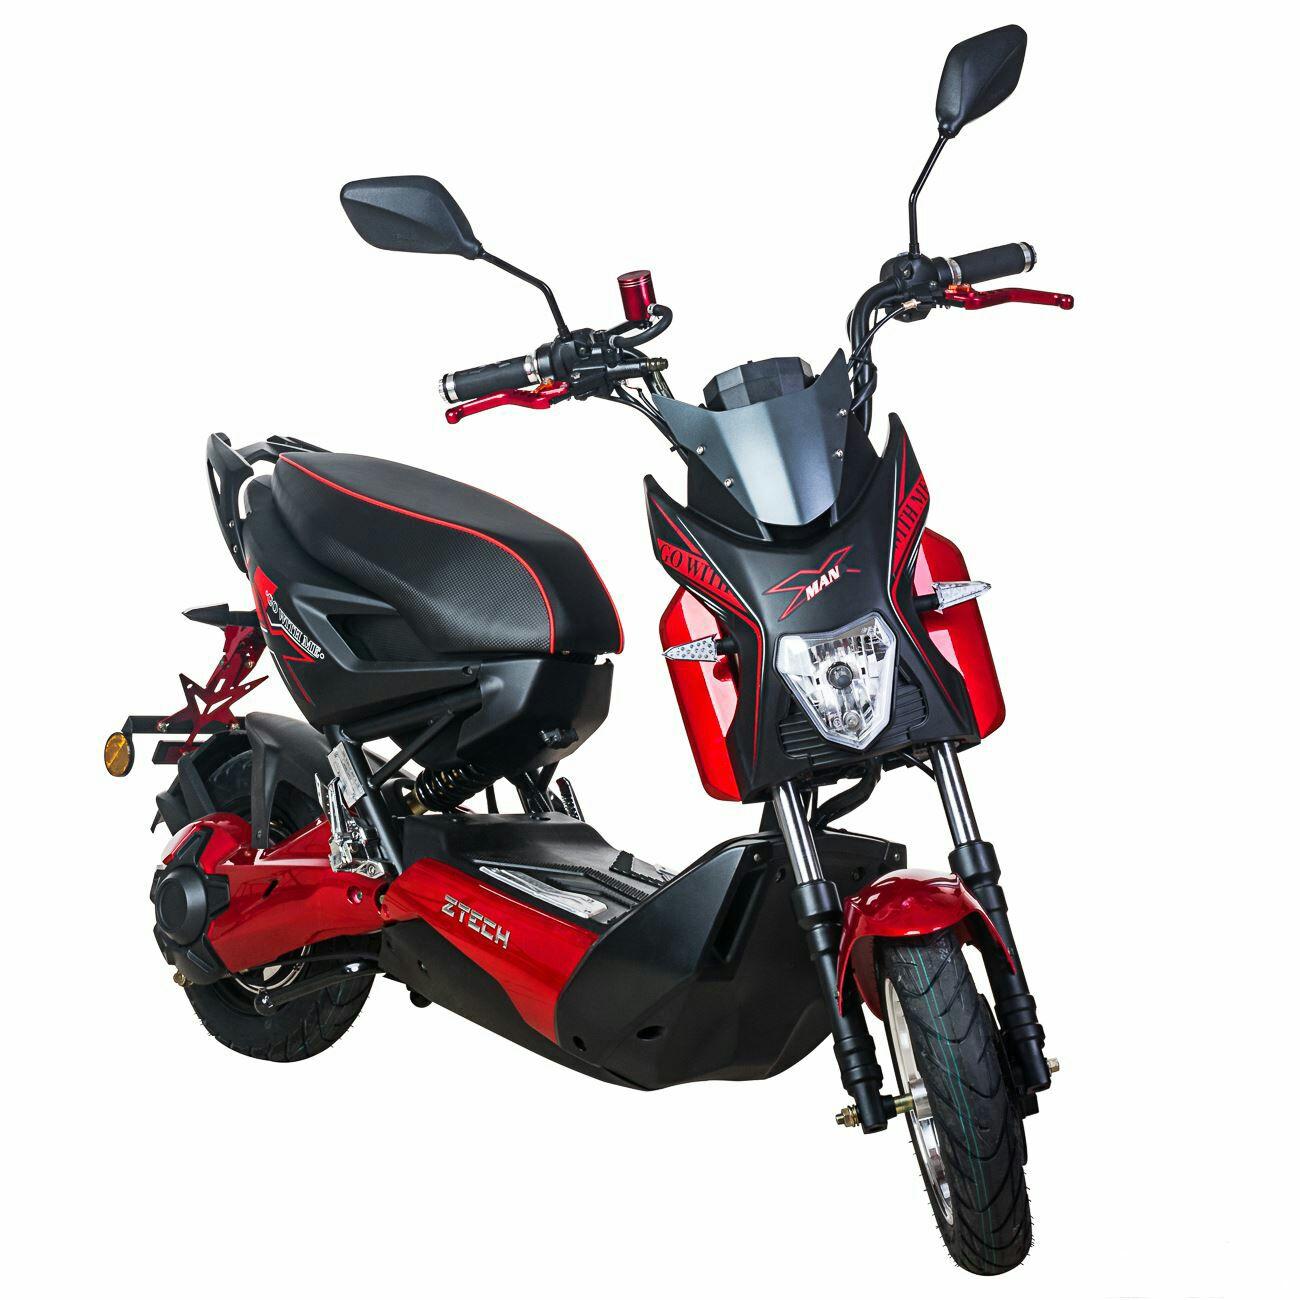 Scooter Eléctrico adulto 1200W Ciclomotor El scooter 45km/h